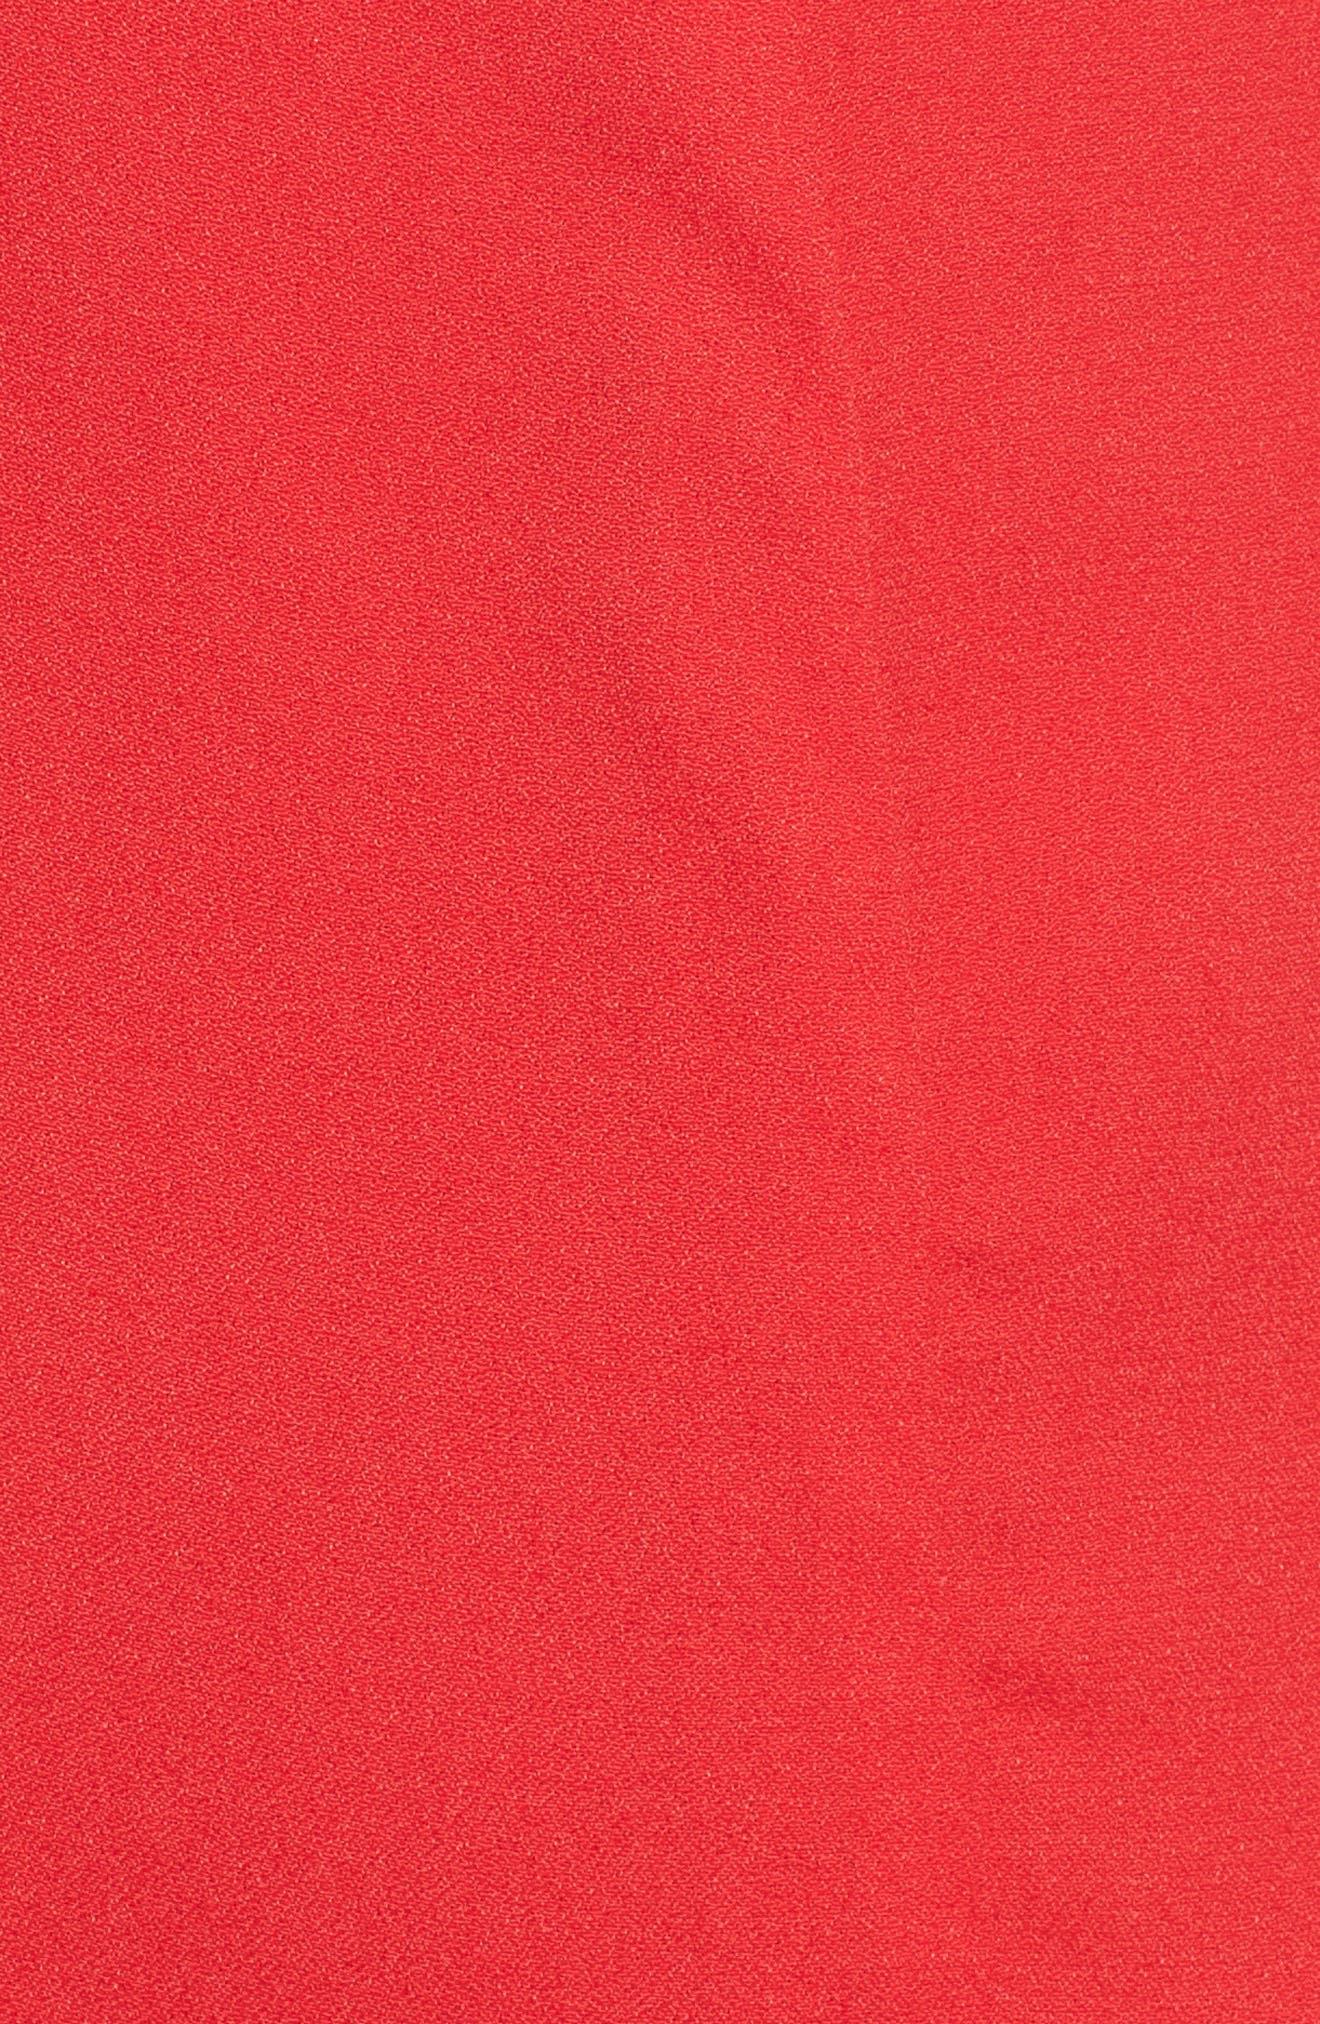 Chelsea Lattice Back Fit & Flare Dress,                             Alternate thumbnail 5, color,                             Red